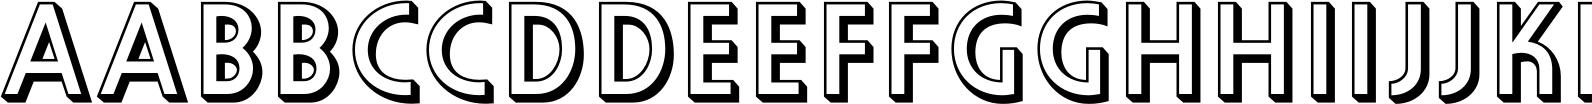 Orplid Pro